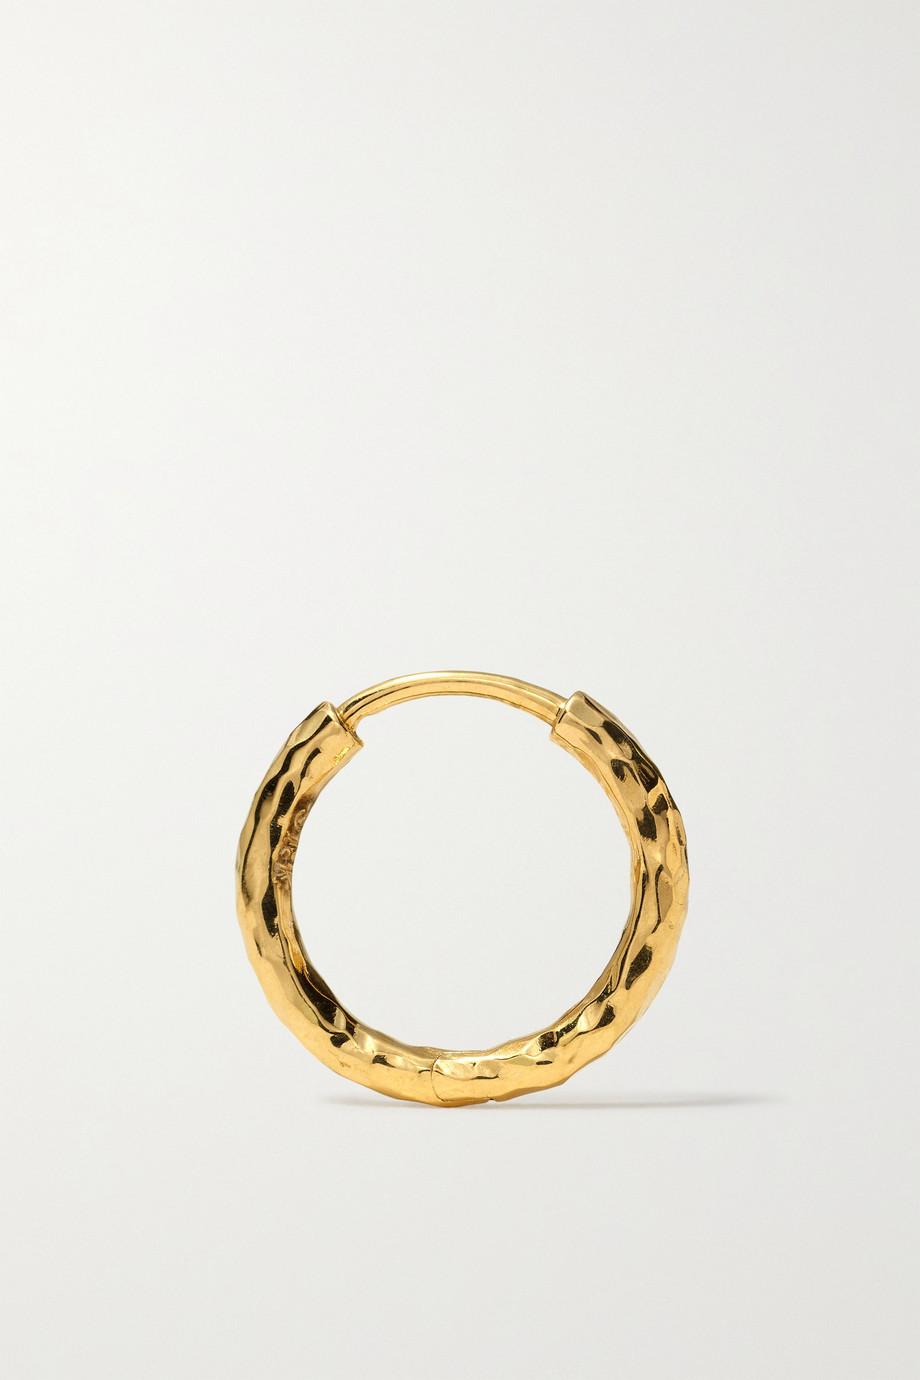 Octavia Elizabeth + NET SUSTAIN Petite Gabby 18-karat recycled gold hoop earrings